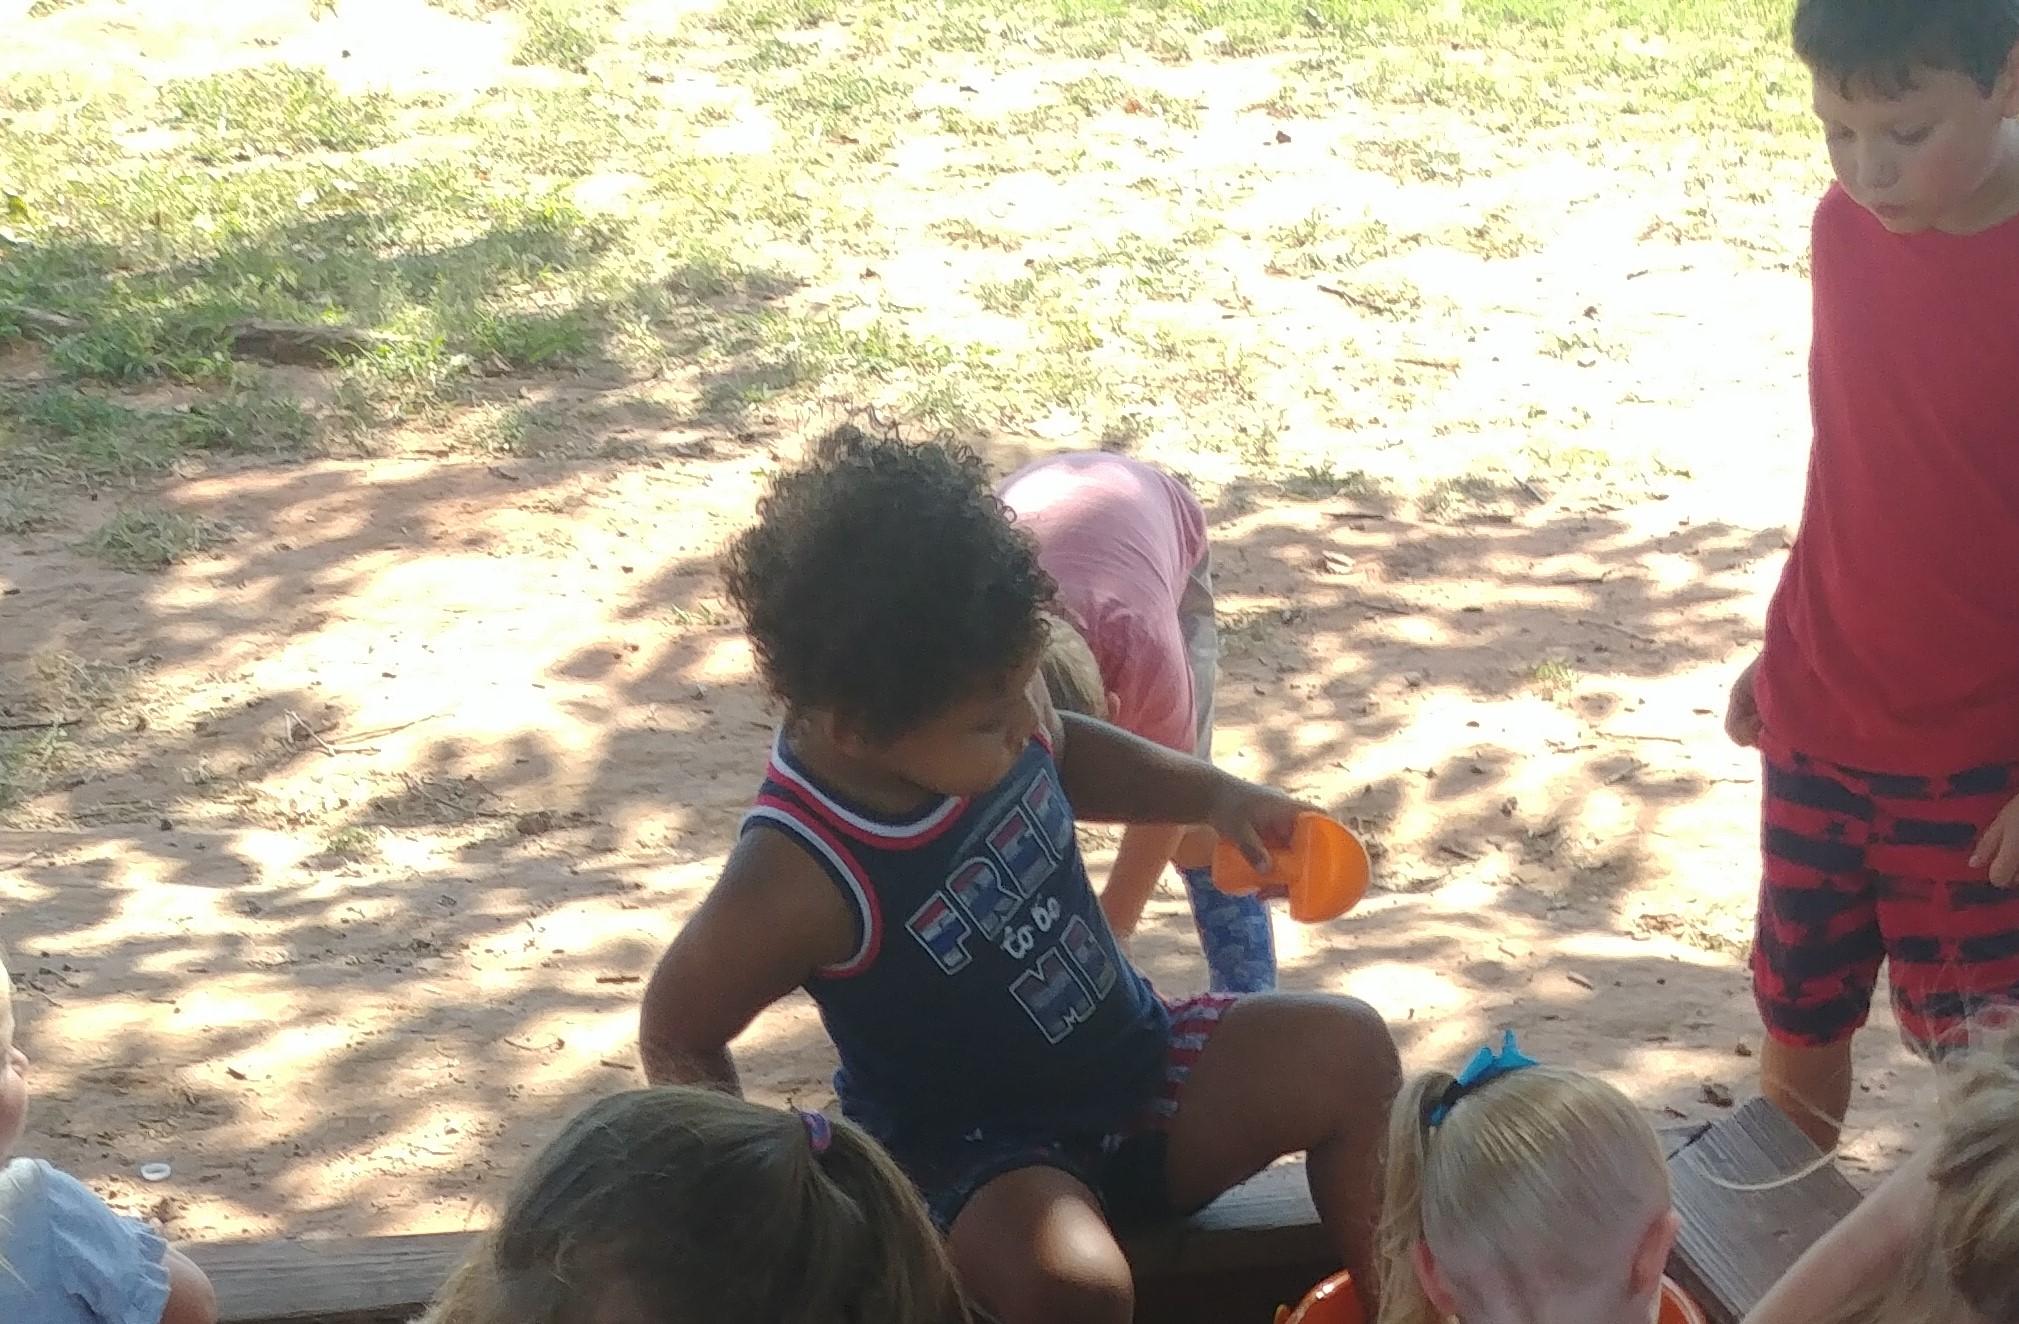 Enjoying recess